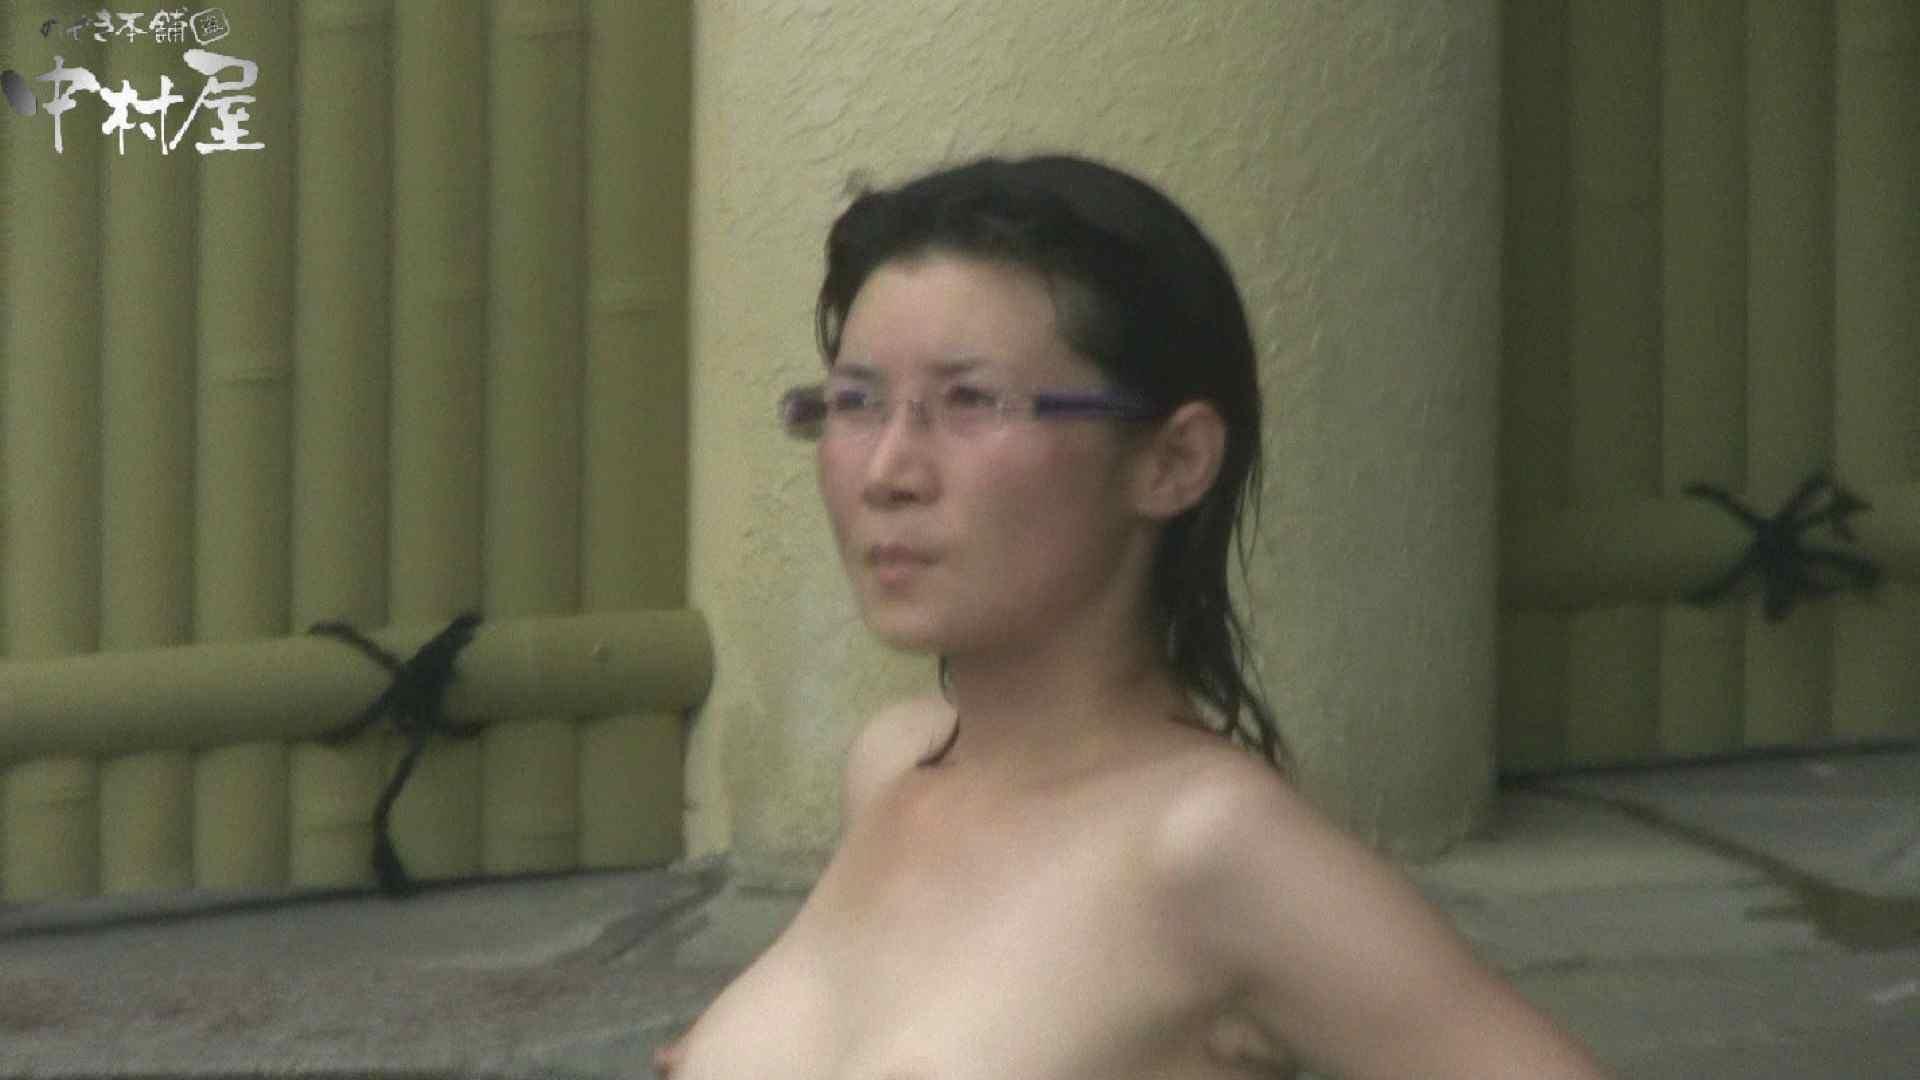 Aquaな露天風呂Vol.905 盗撮   OLエロ画像  67PICs 16